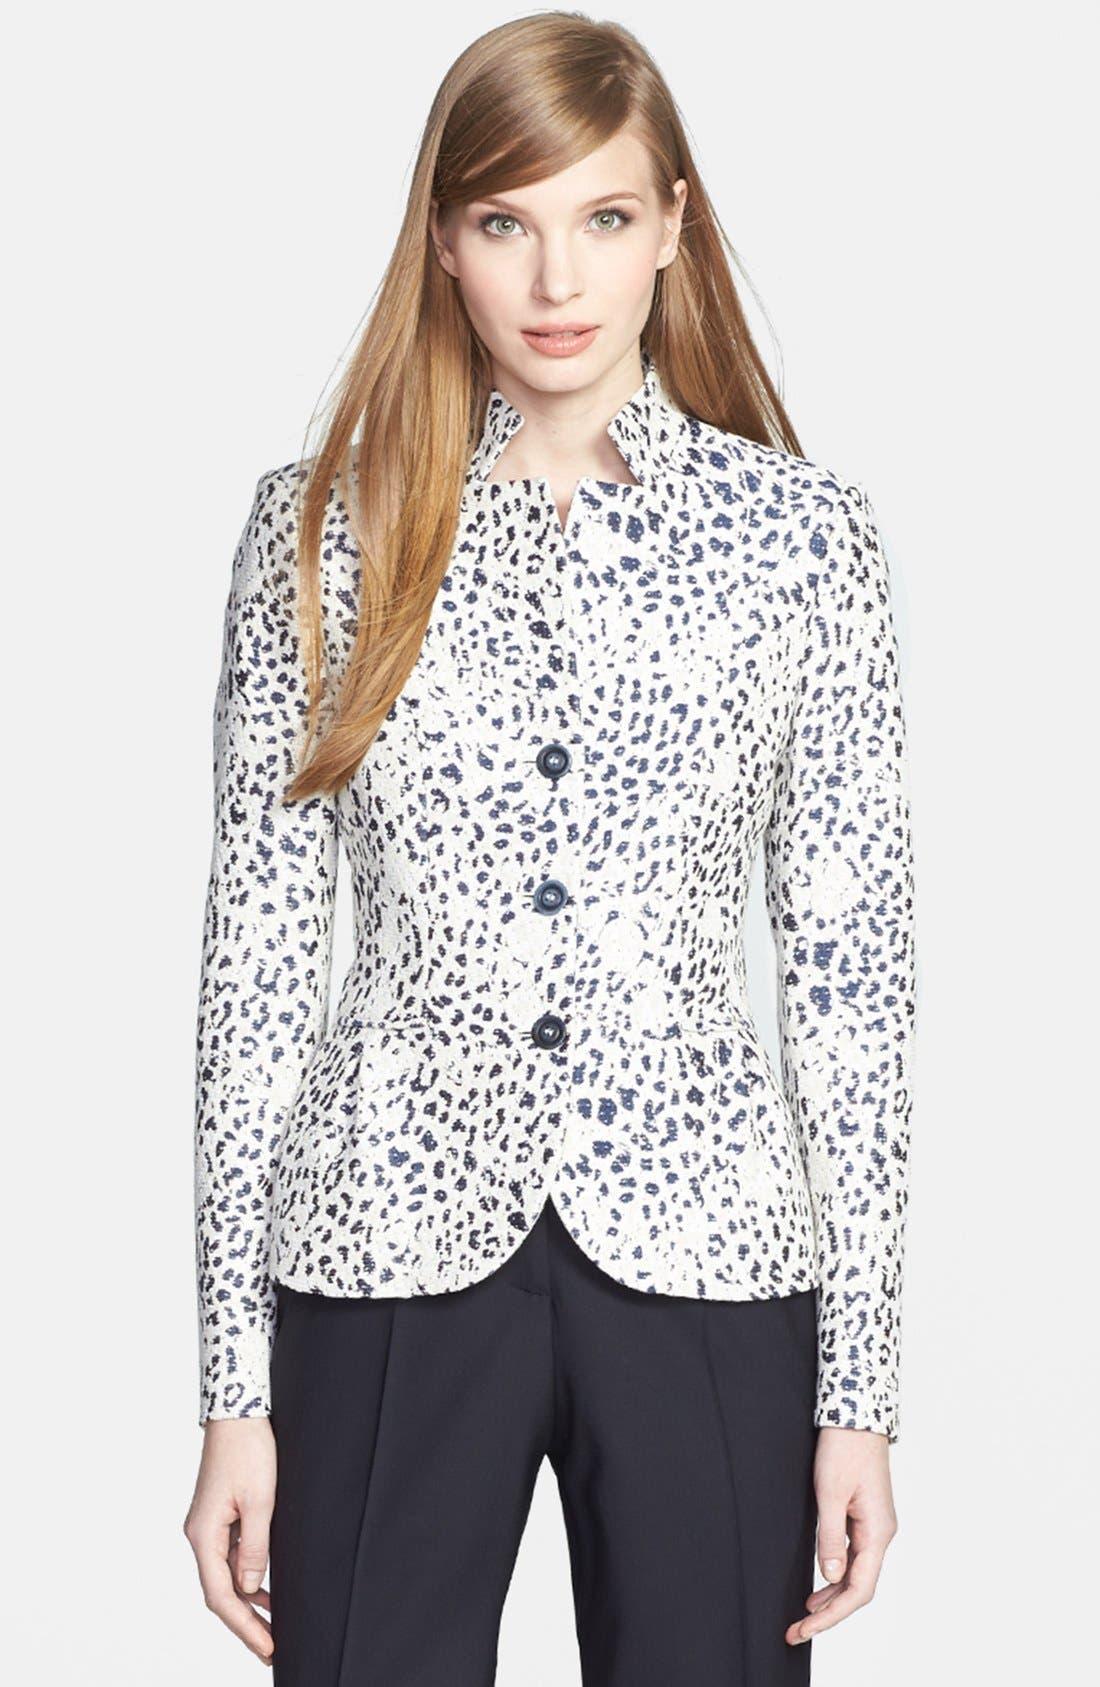 Main Image - Santorelli Leopard Jacquard Jacket